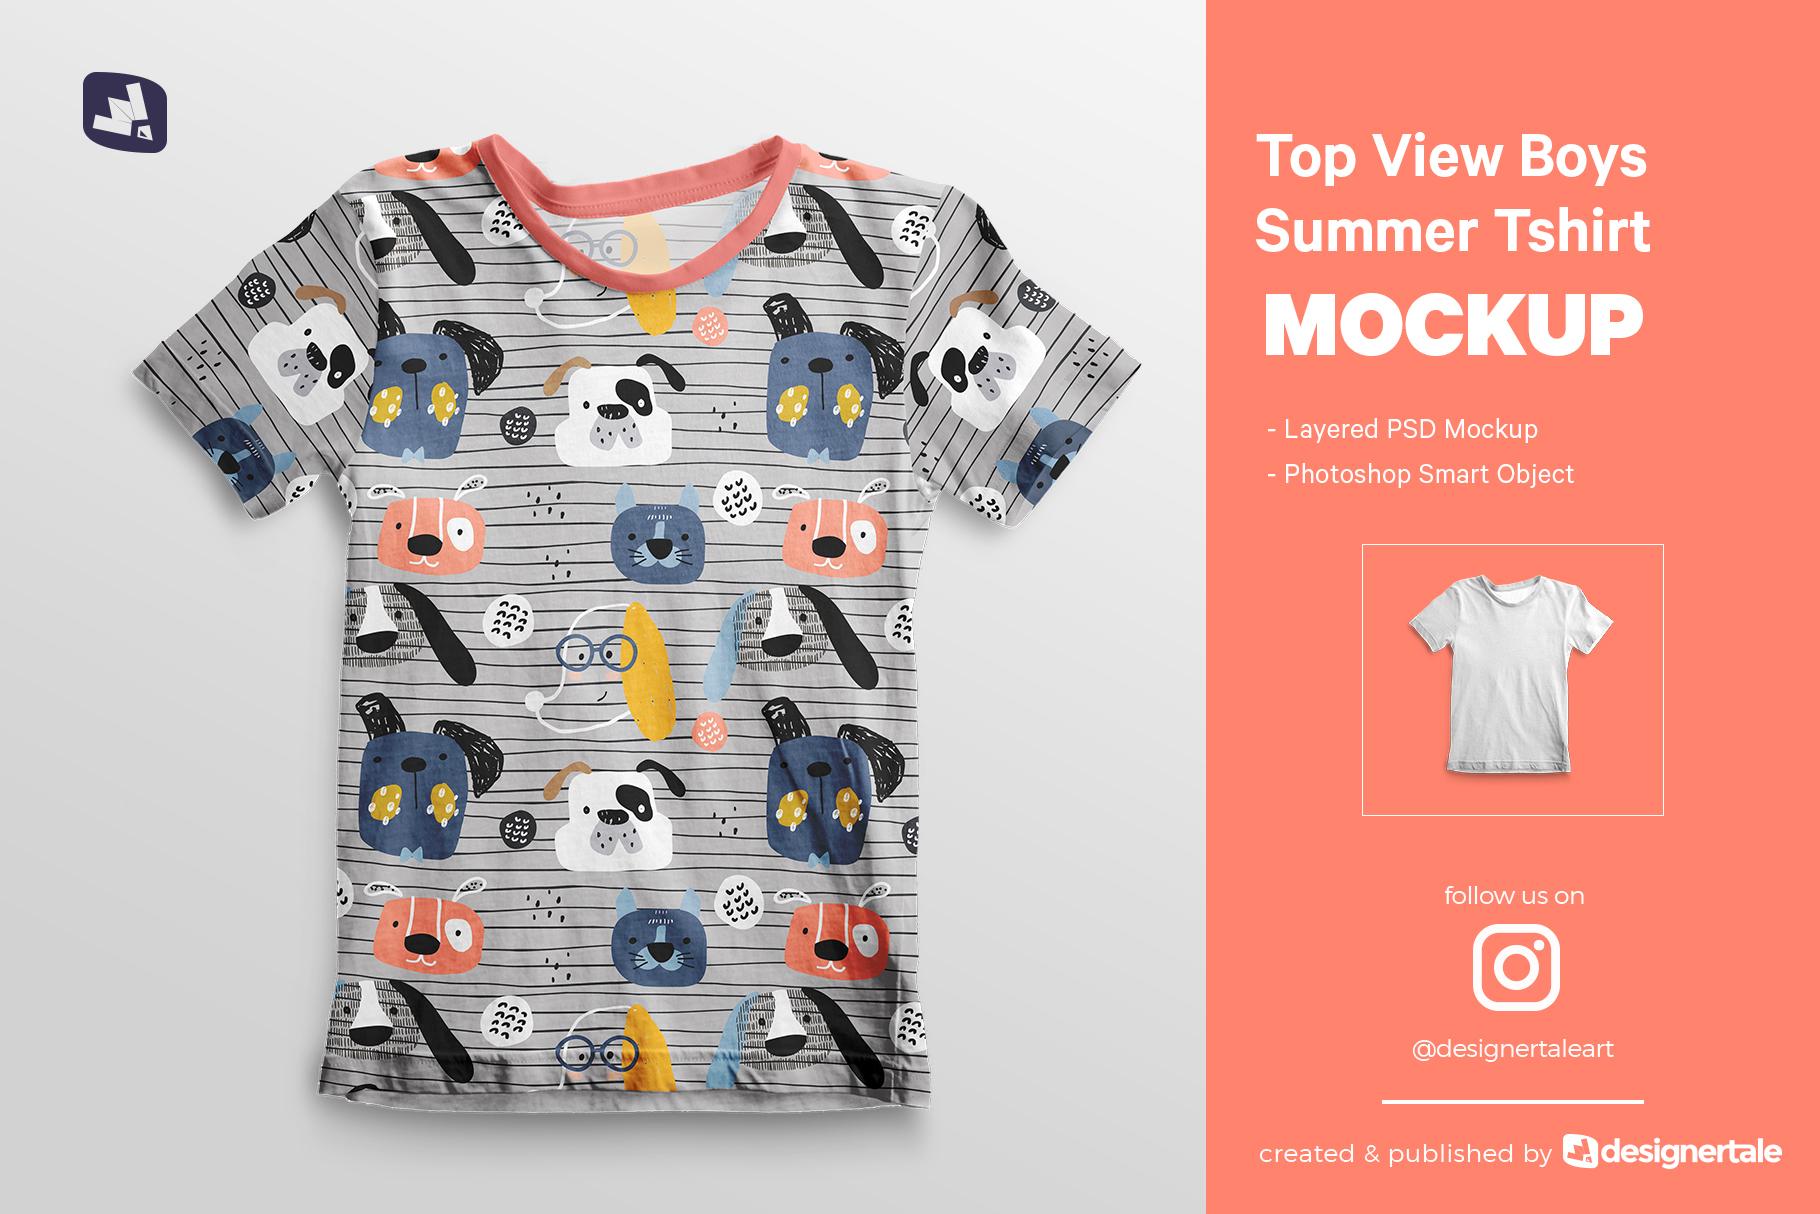 top view boy's summer tshirt mockup